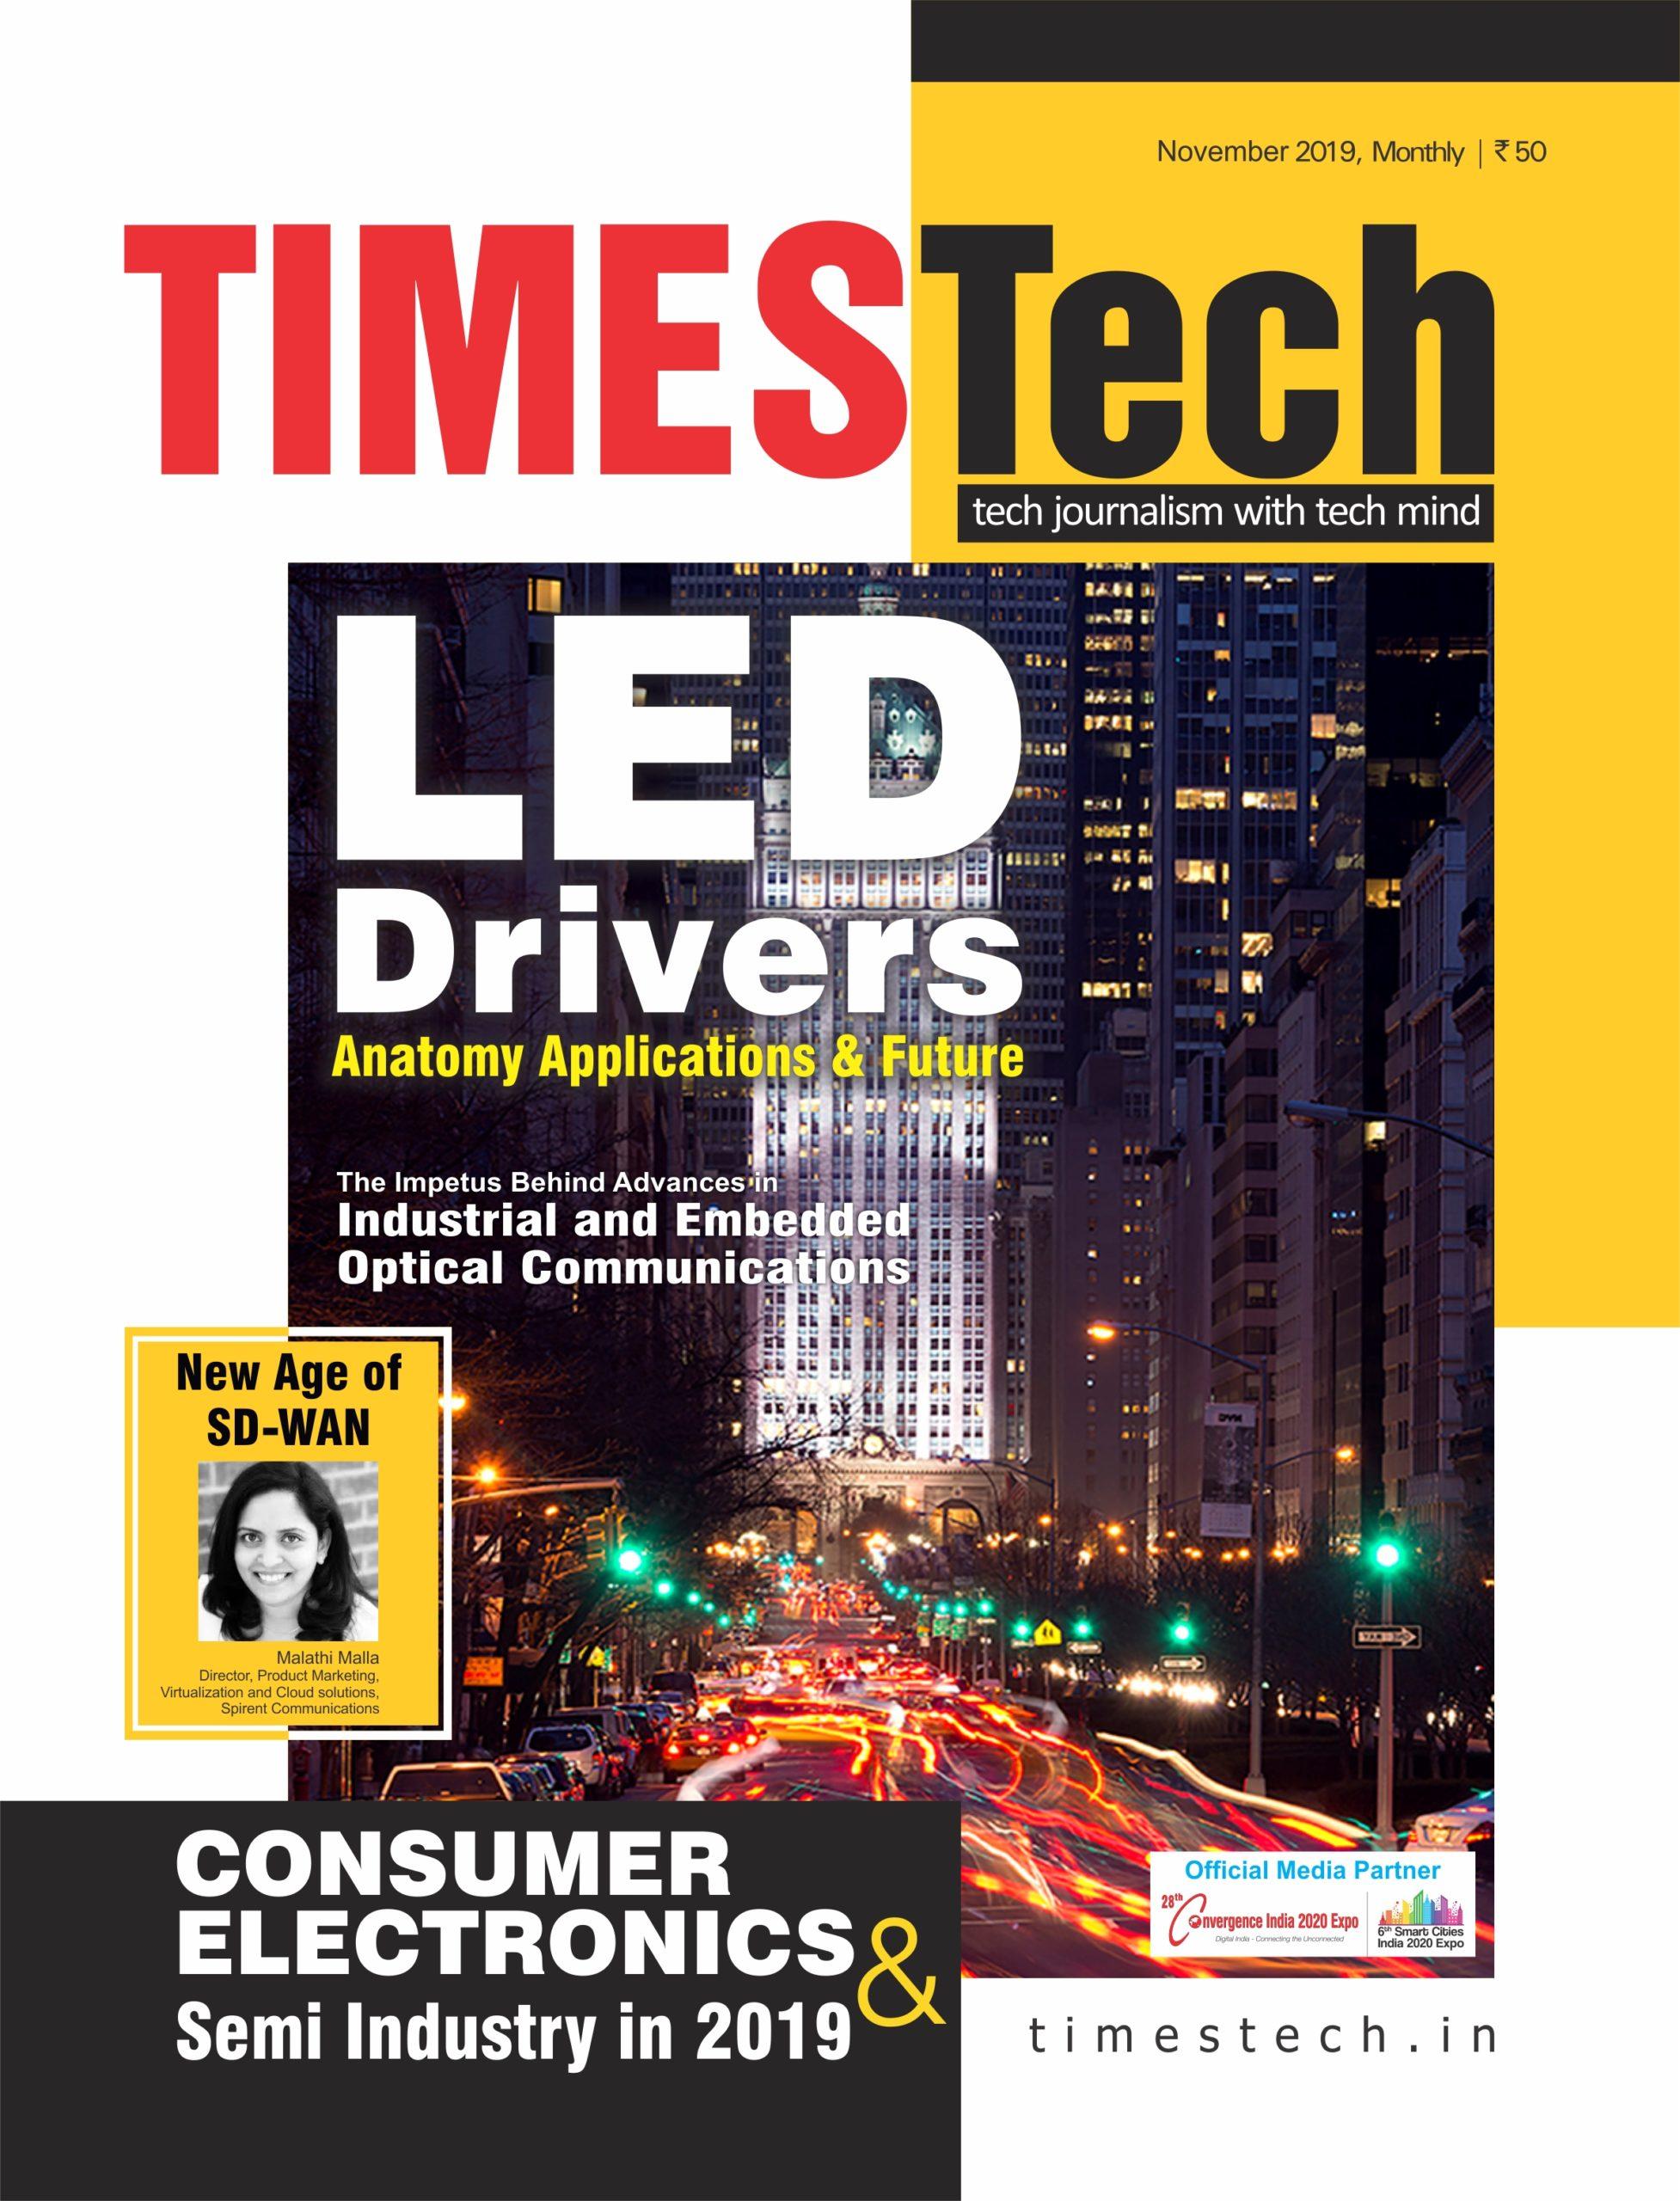 TimesTech Nov 2019